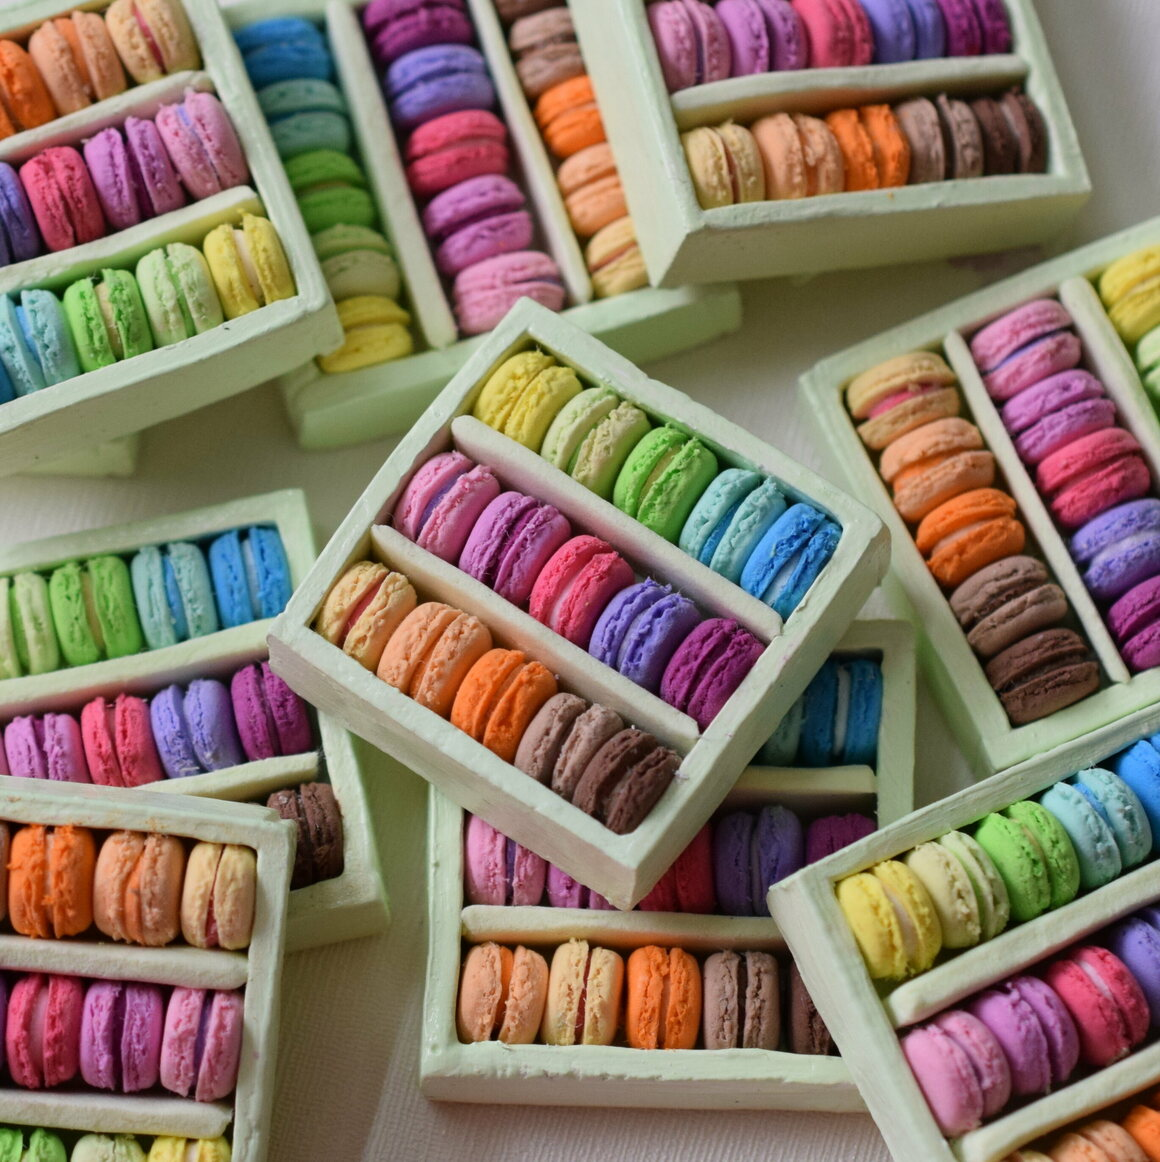 Colorful French macarons on display.